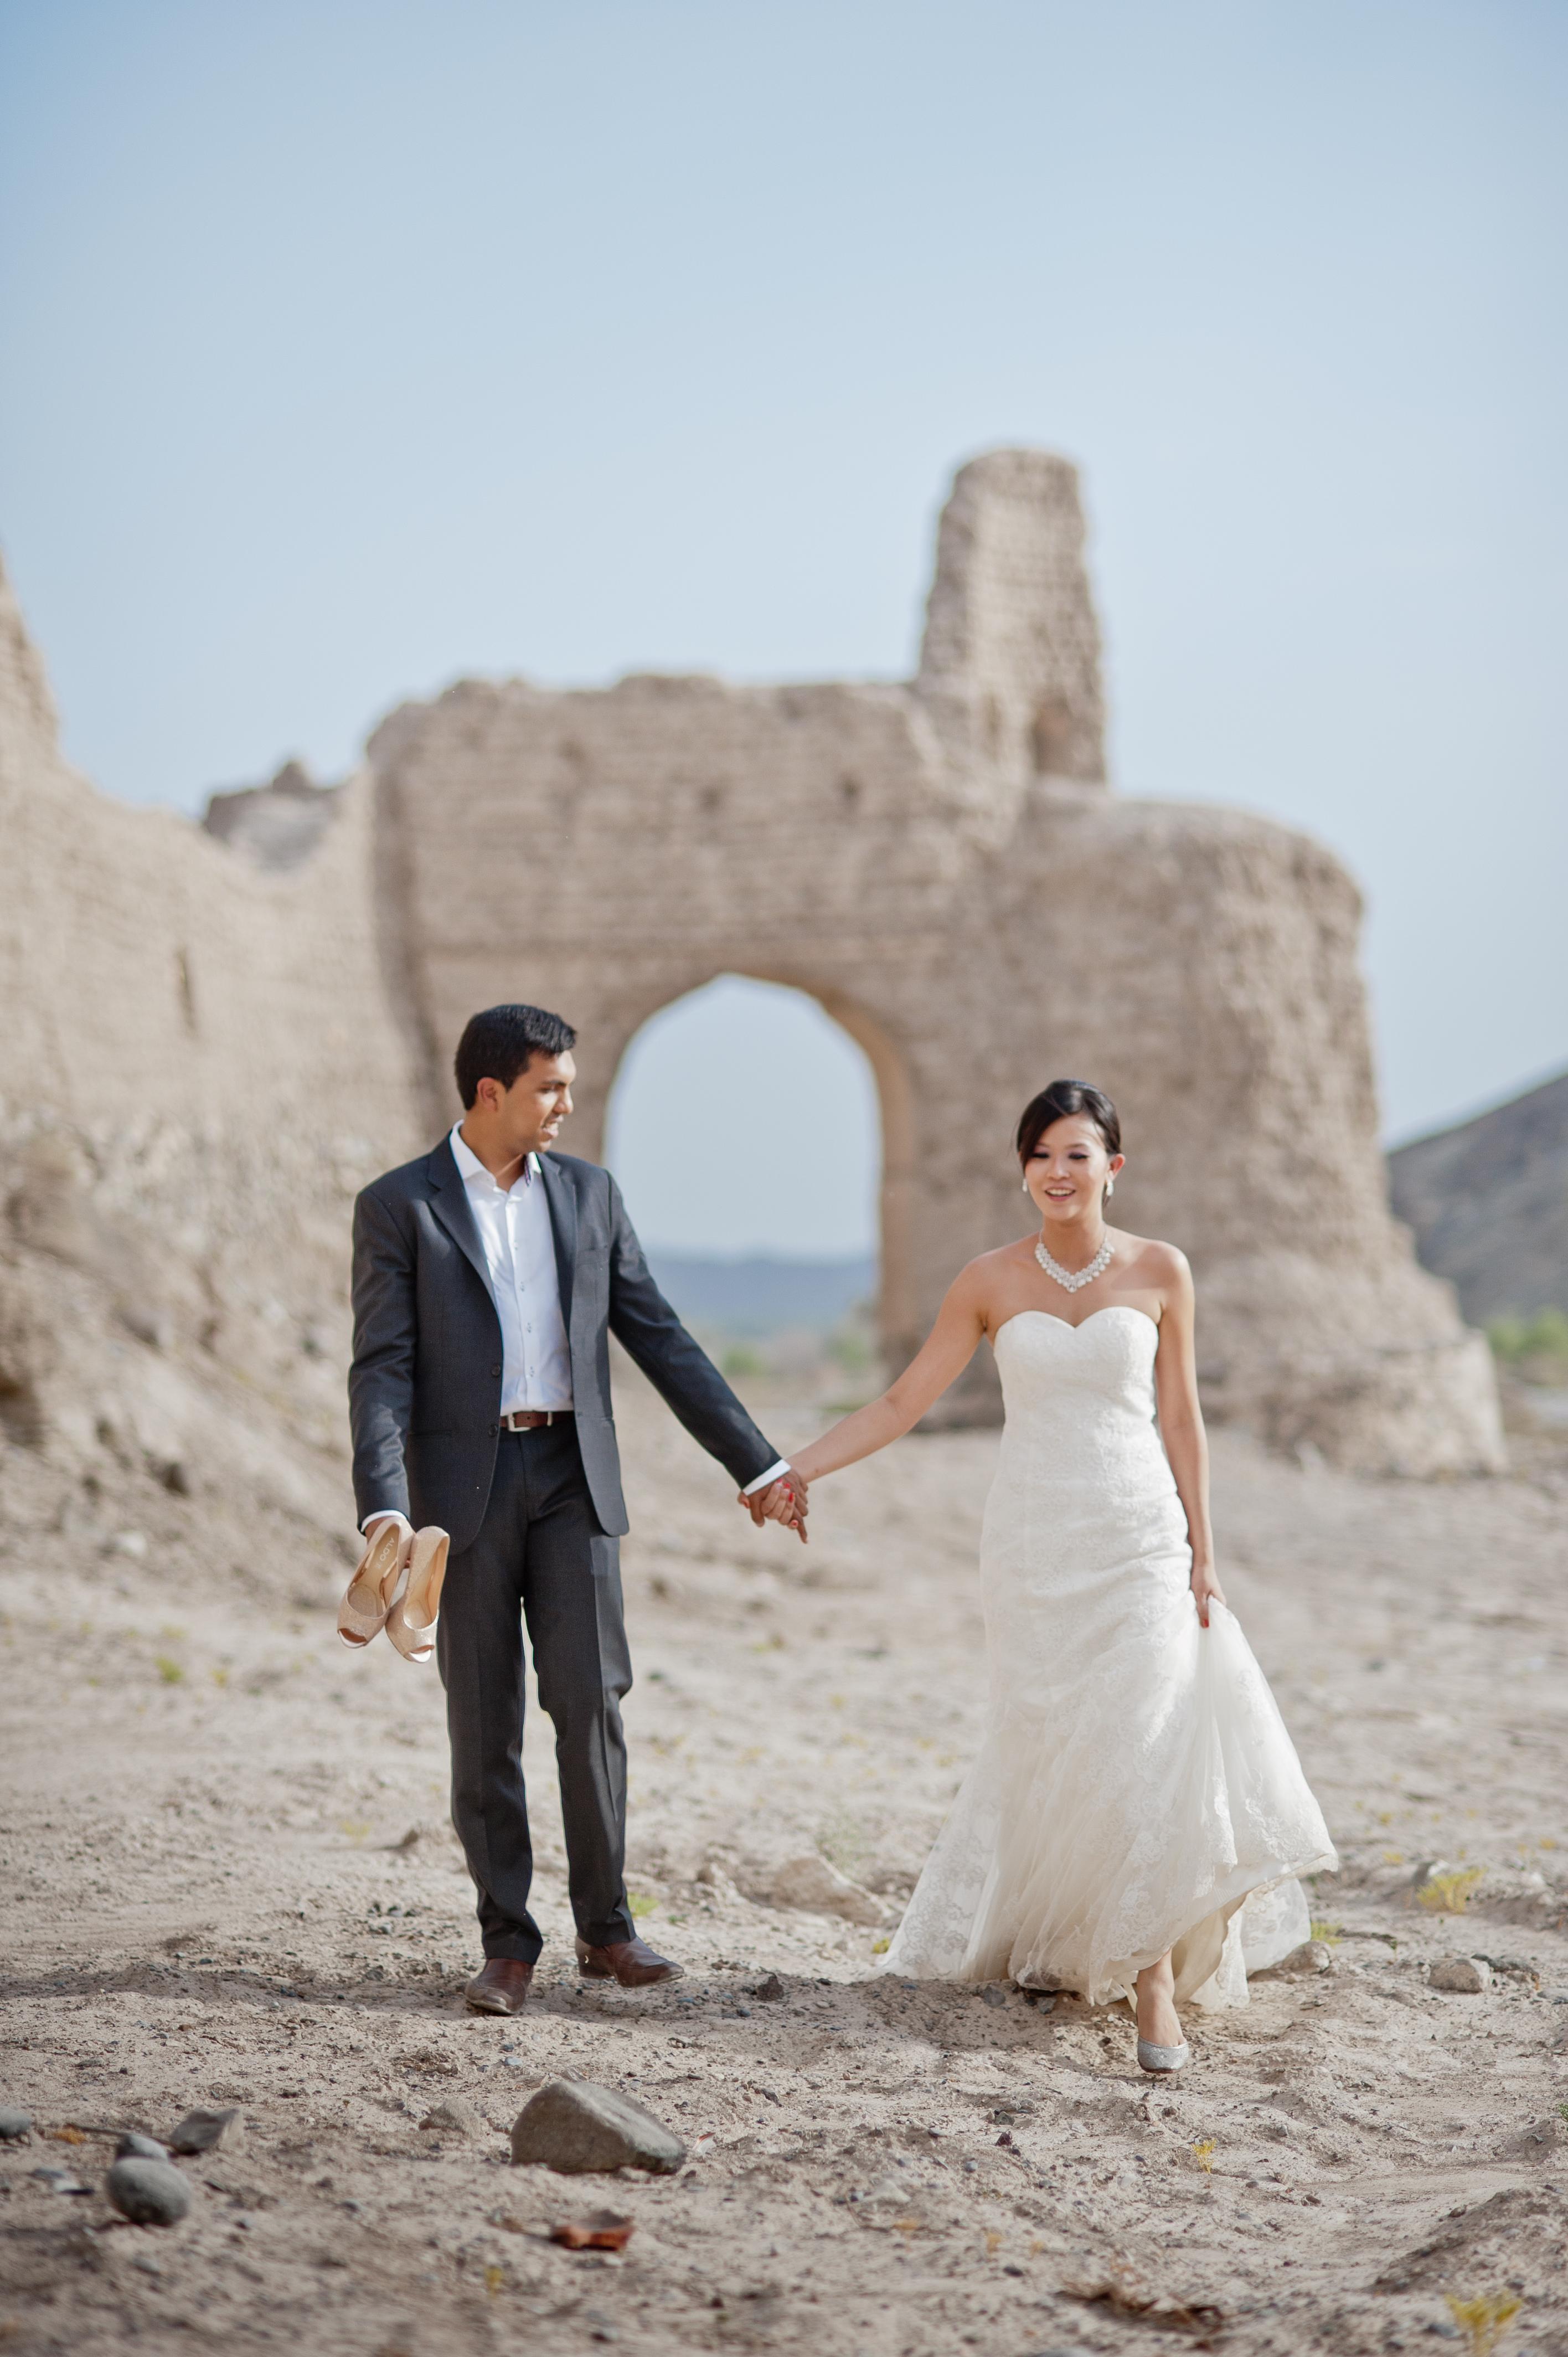 Oman-Wedding-Photographer-031